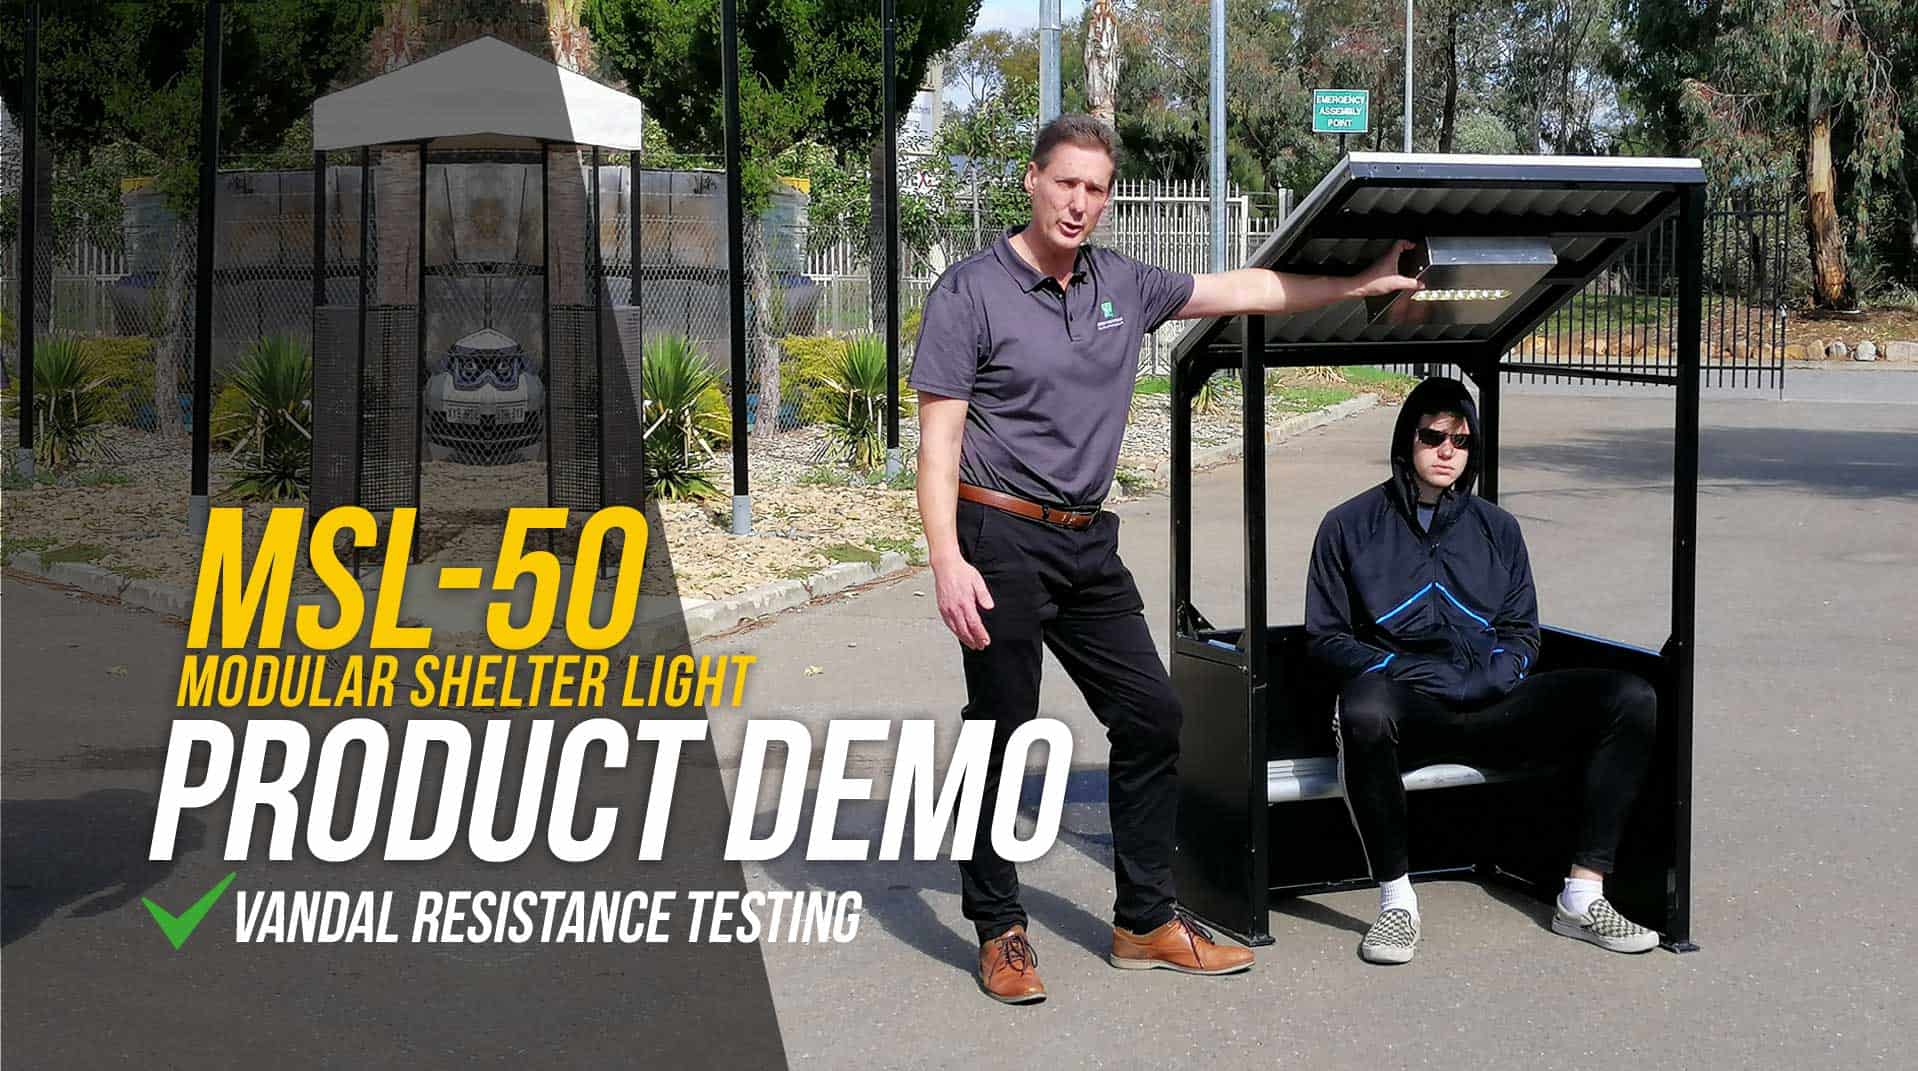 Vandal resistance testing of teh GFS-50-MSL